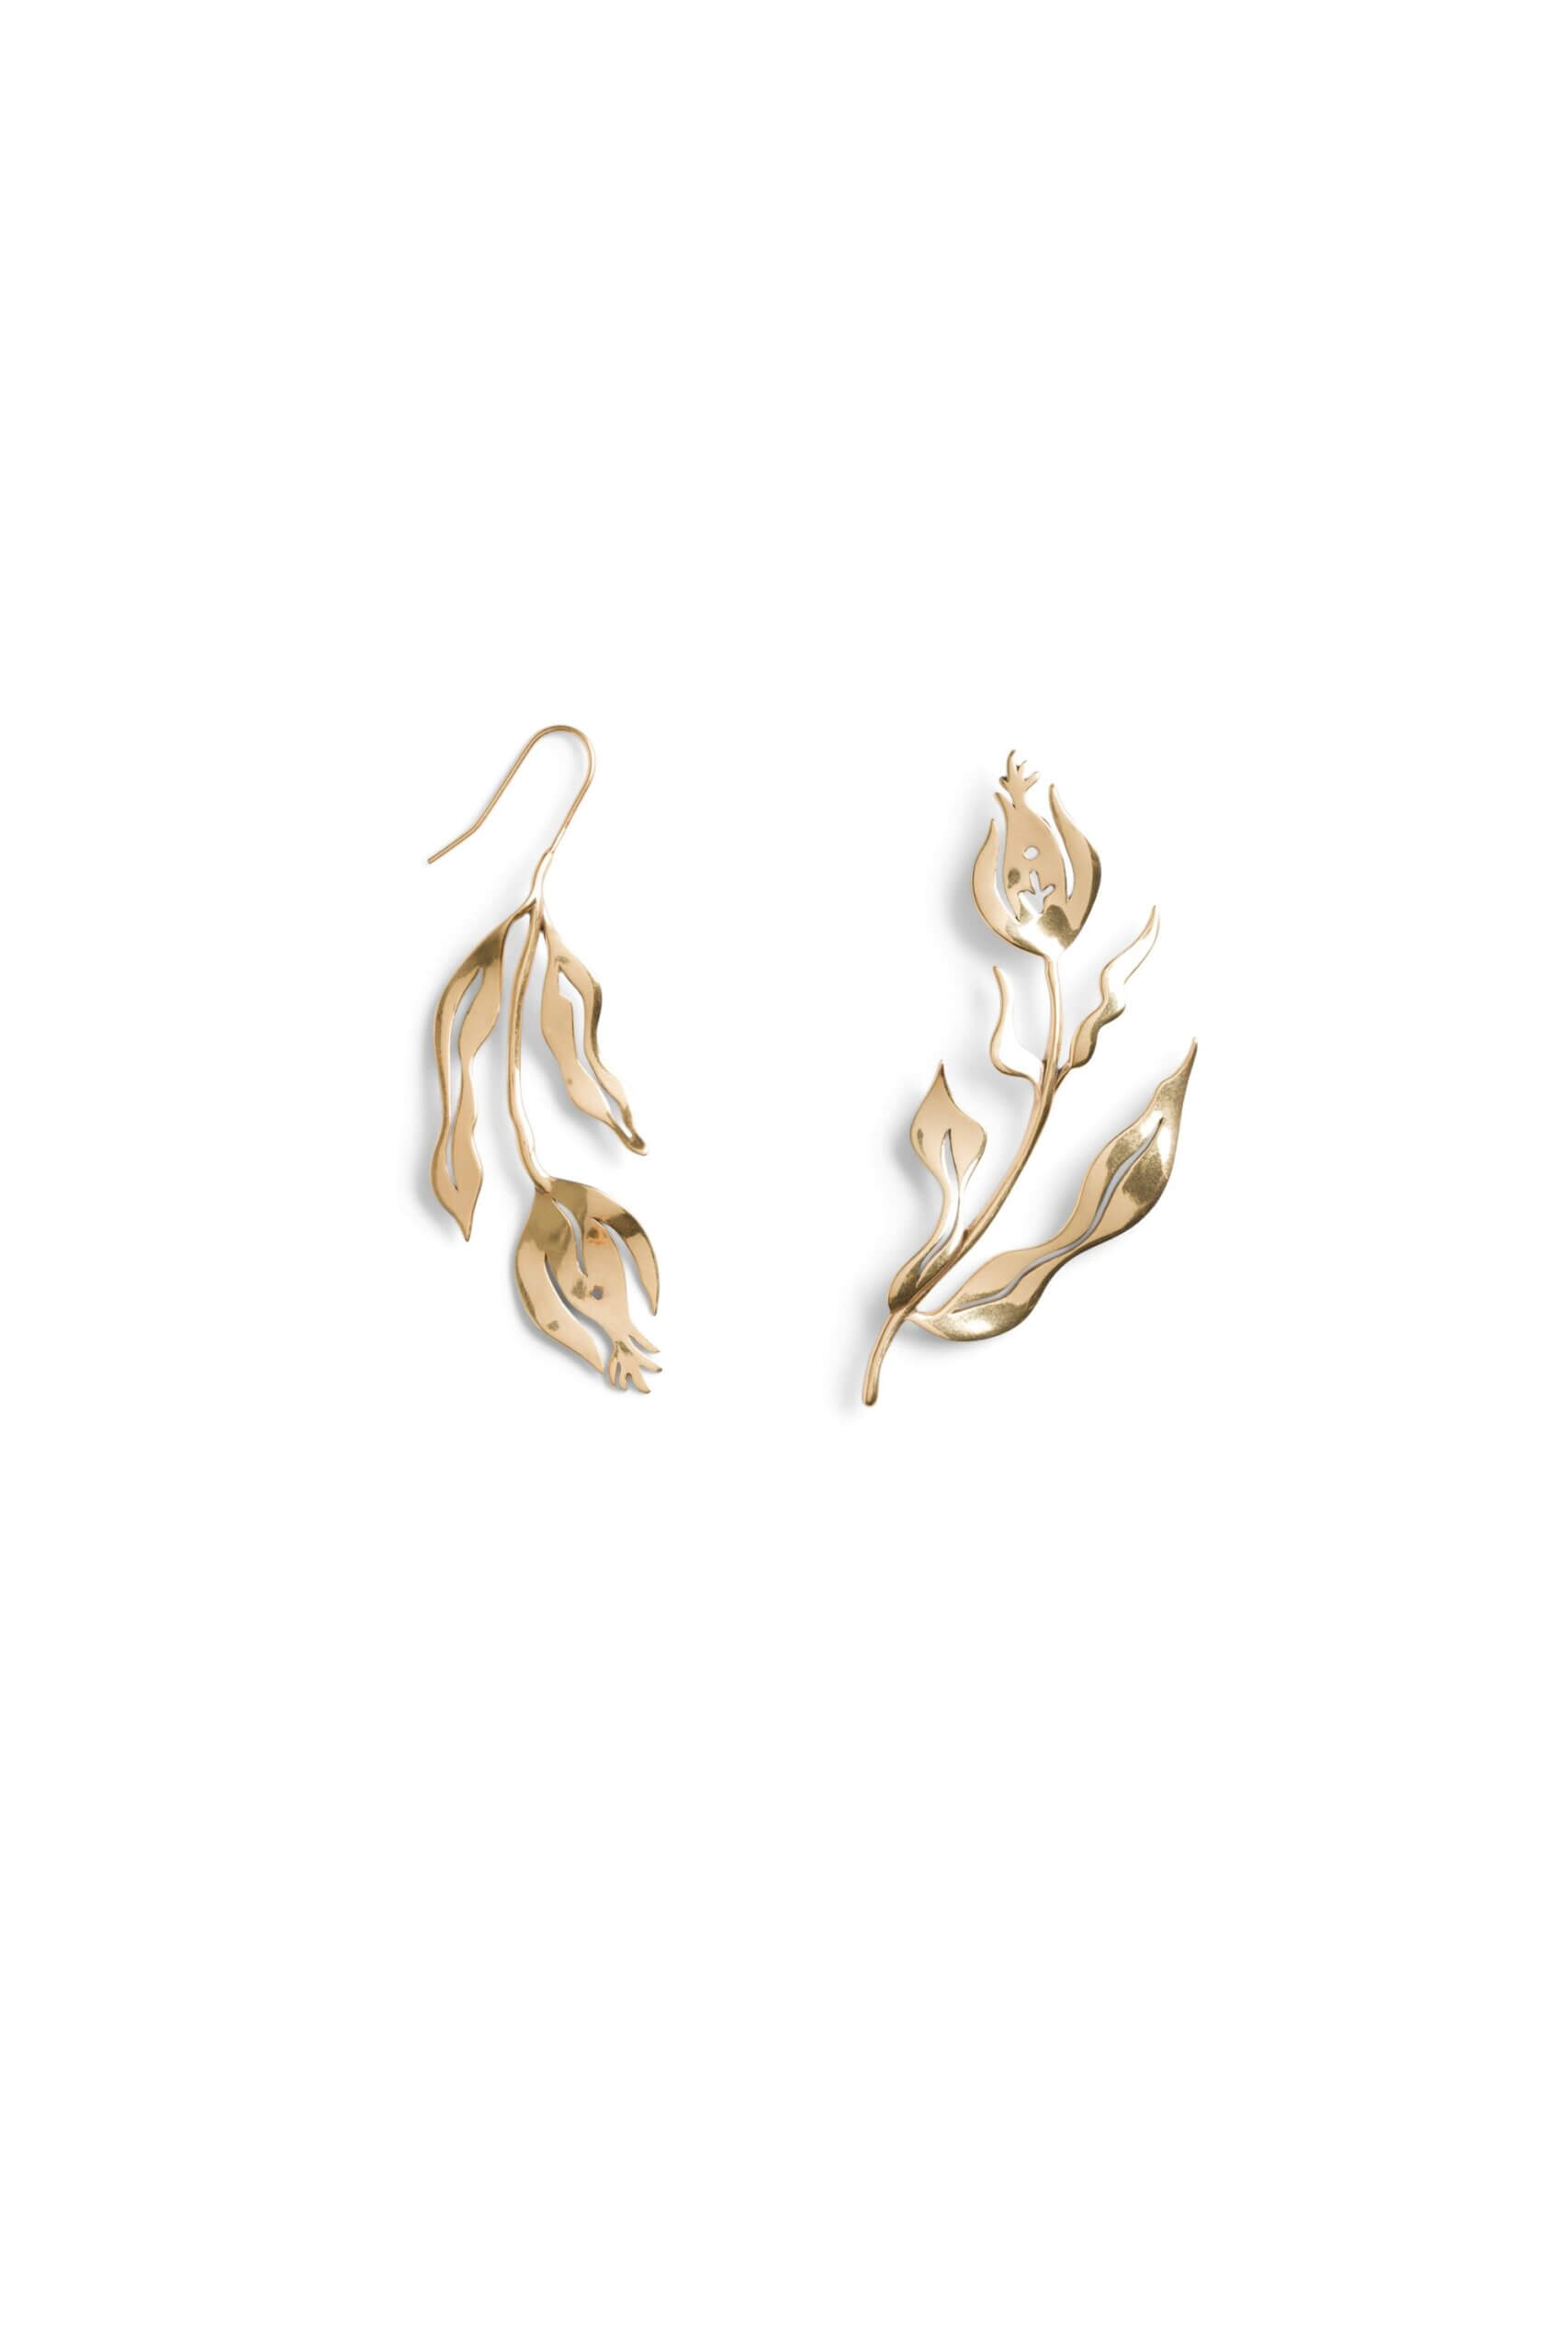 Stitch Fix women's gold leaf earrings.